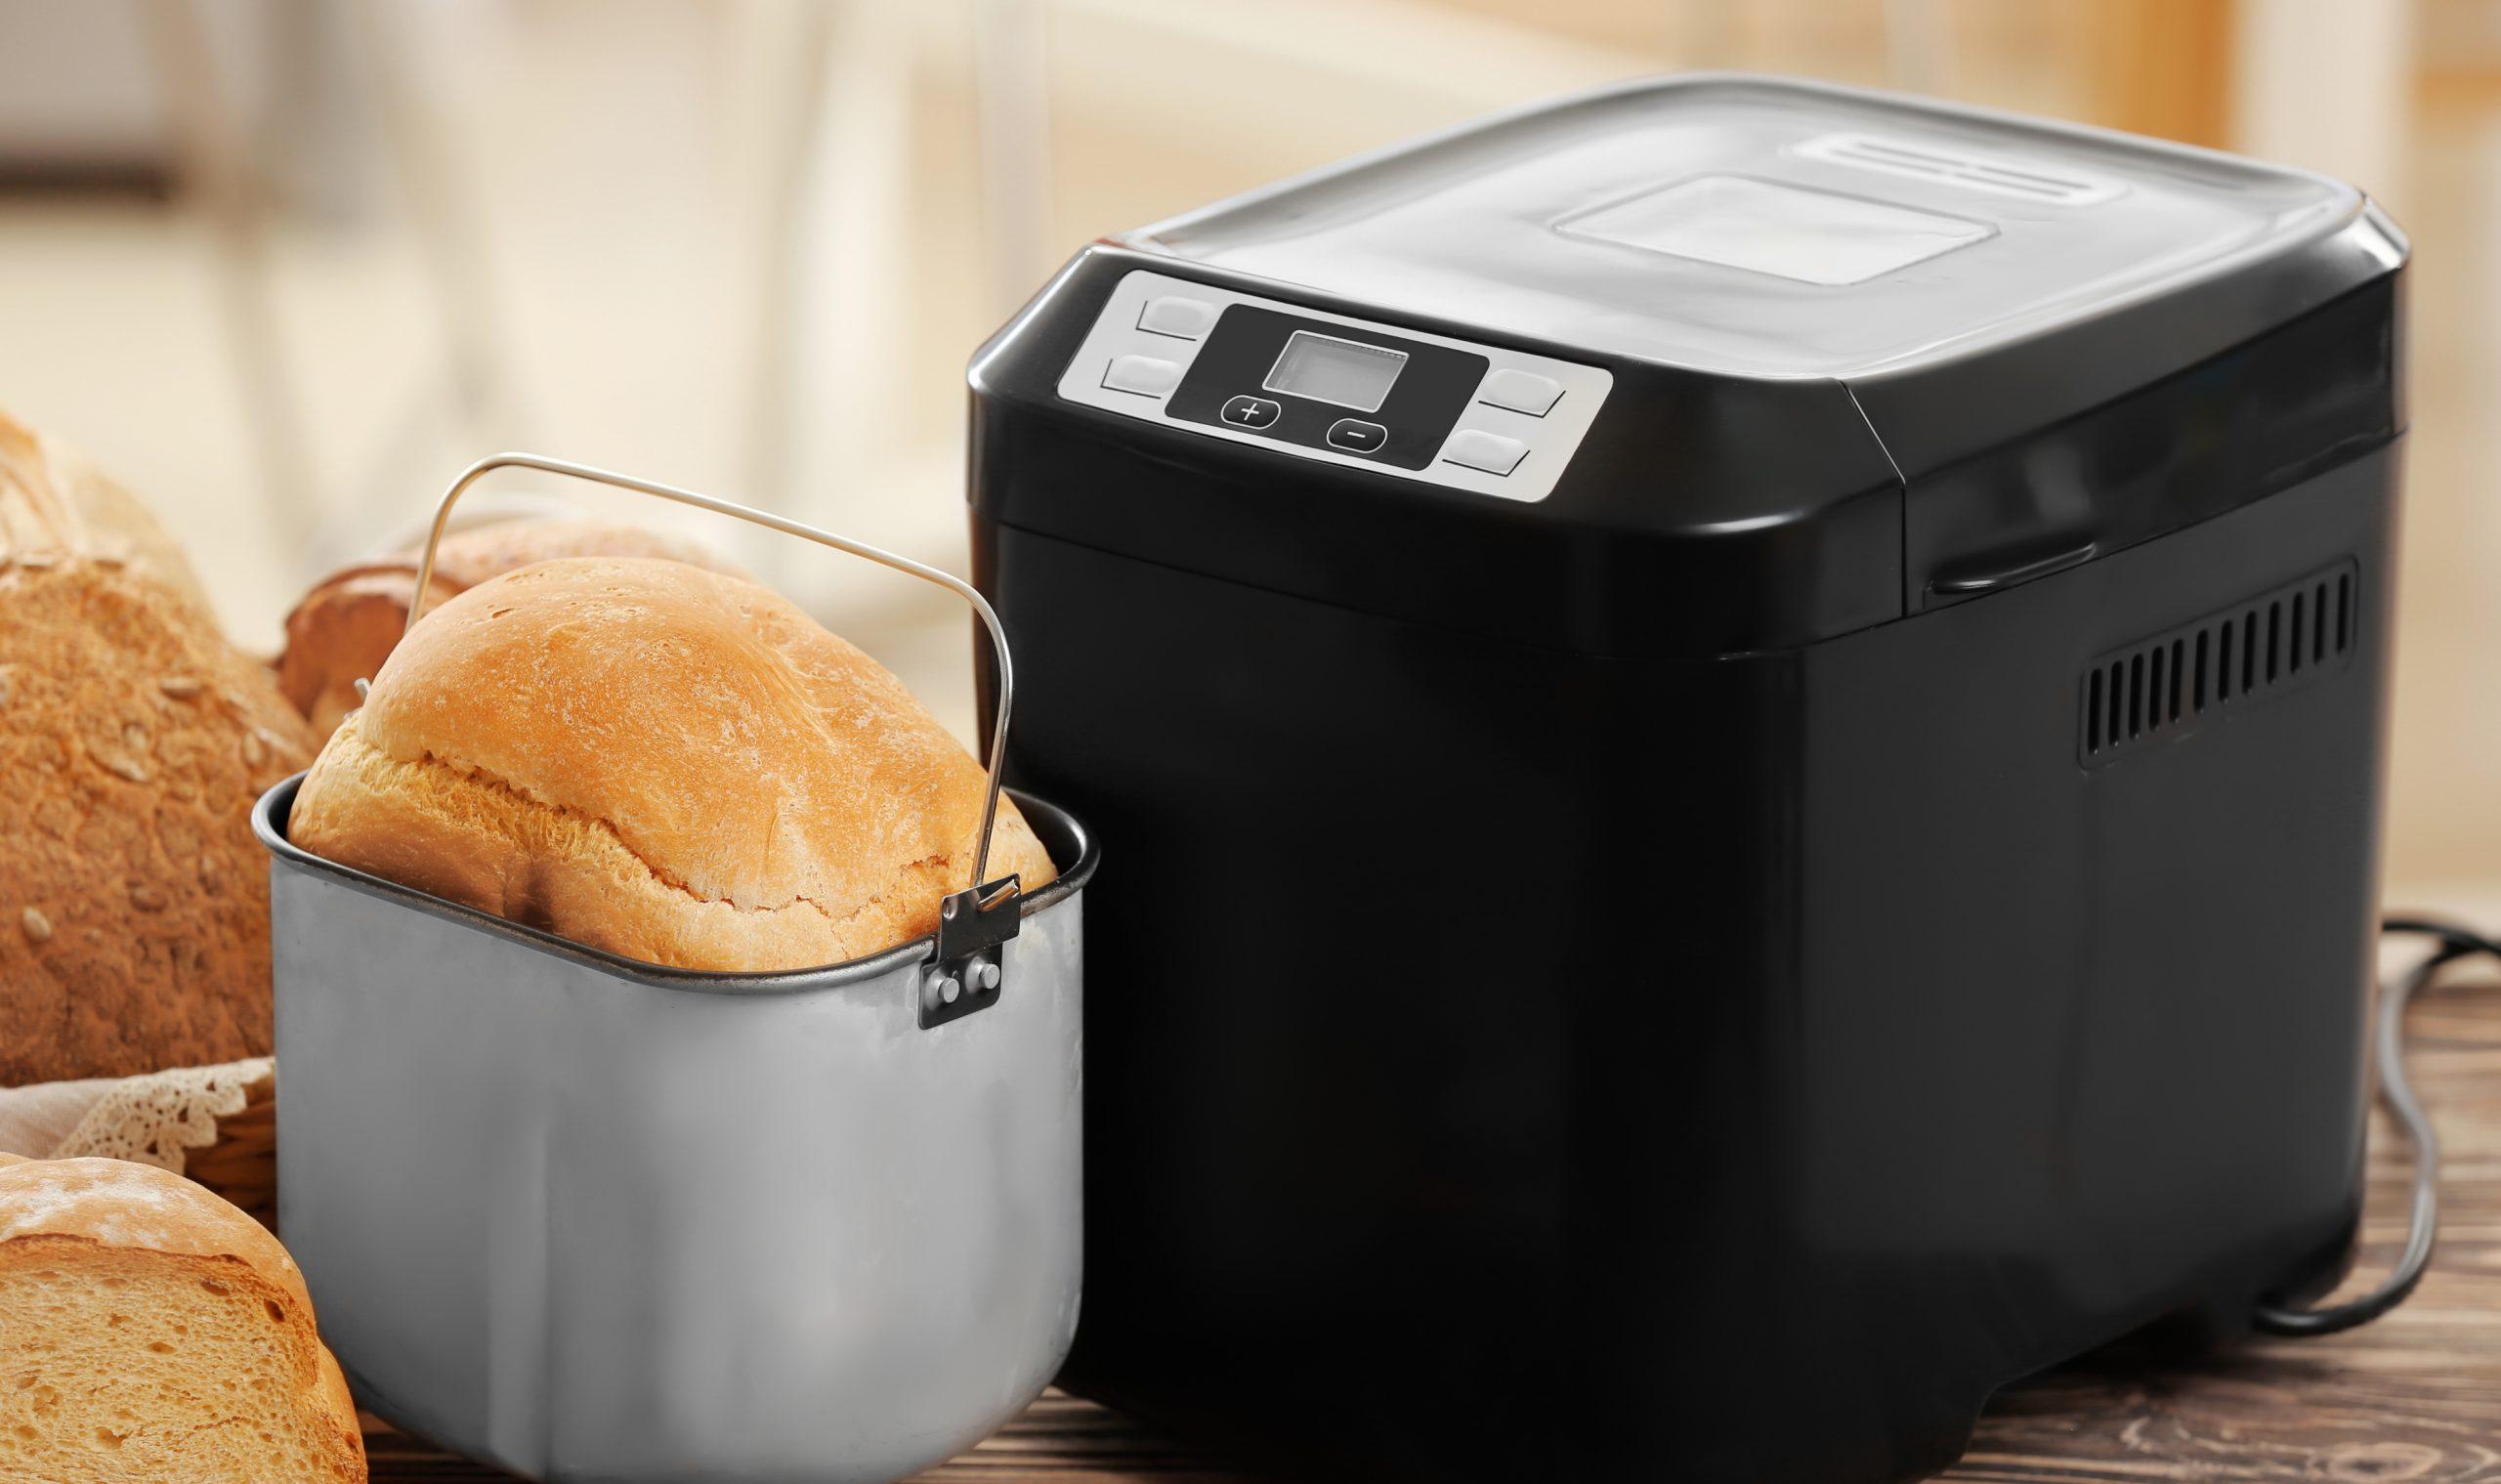 Macchina del pane nero